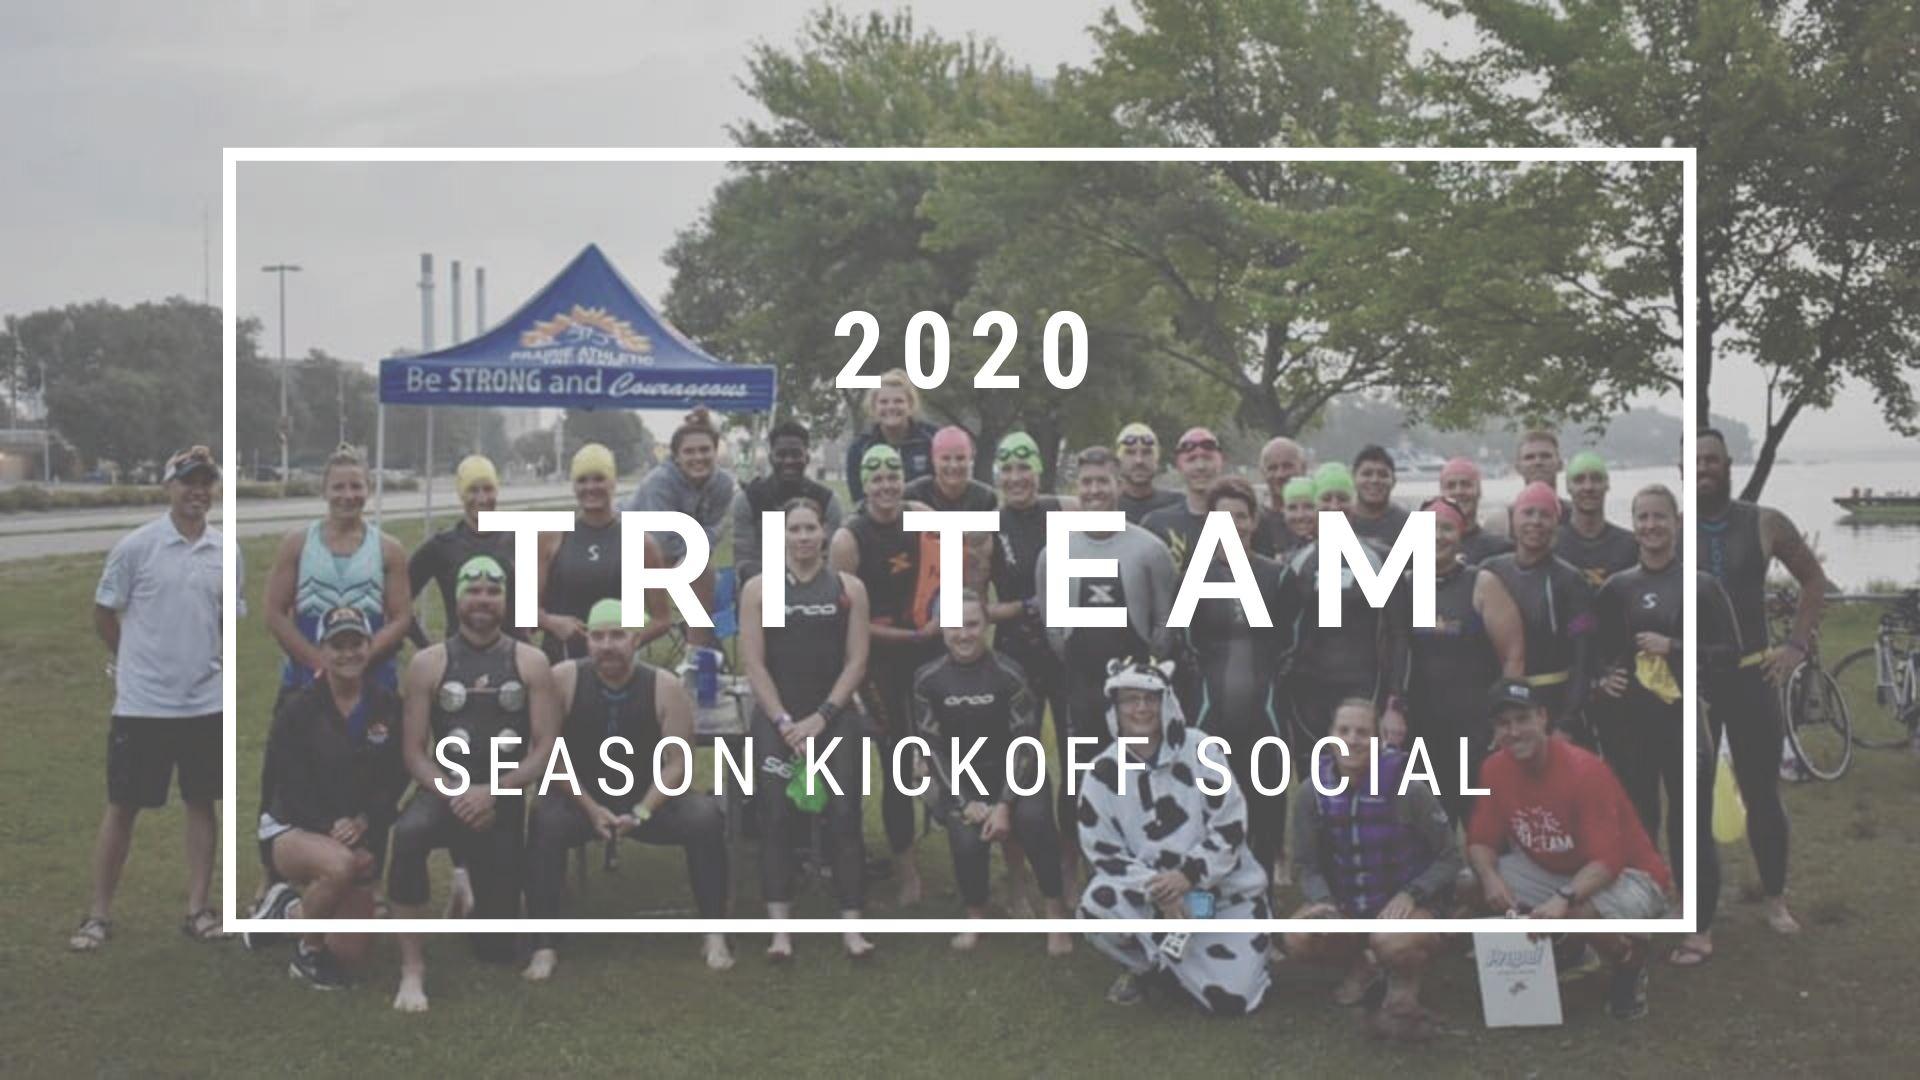 2020 Tri Team Season Kickoff Social